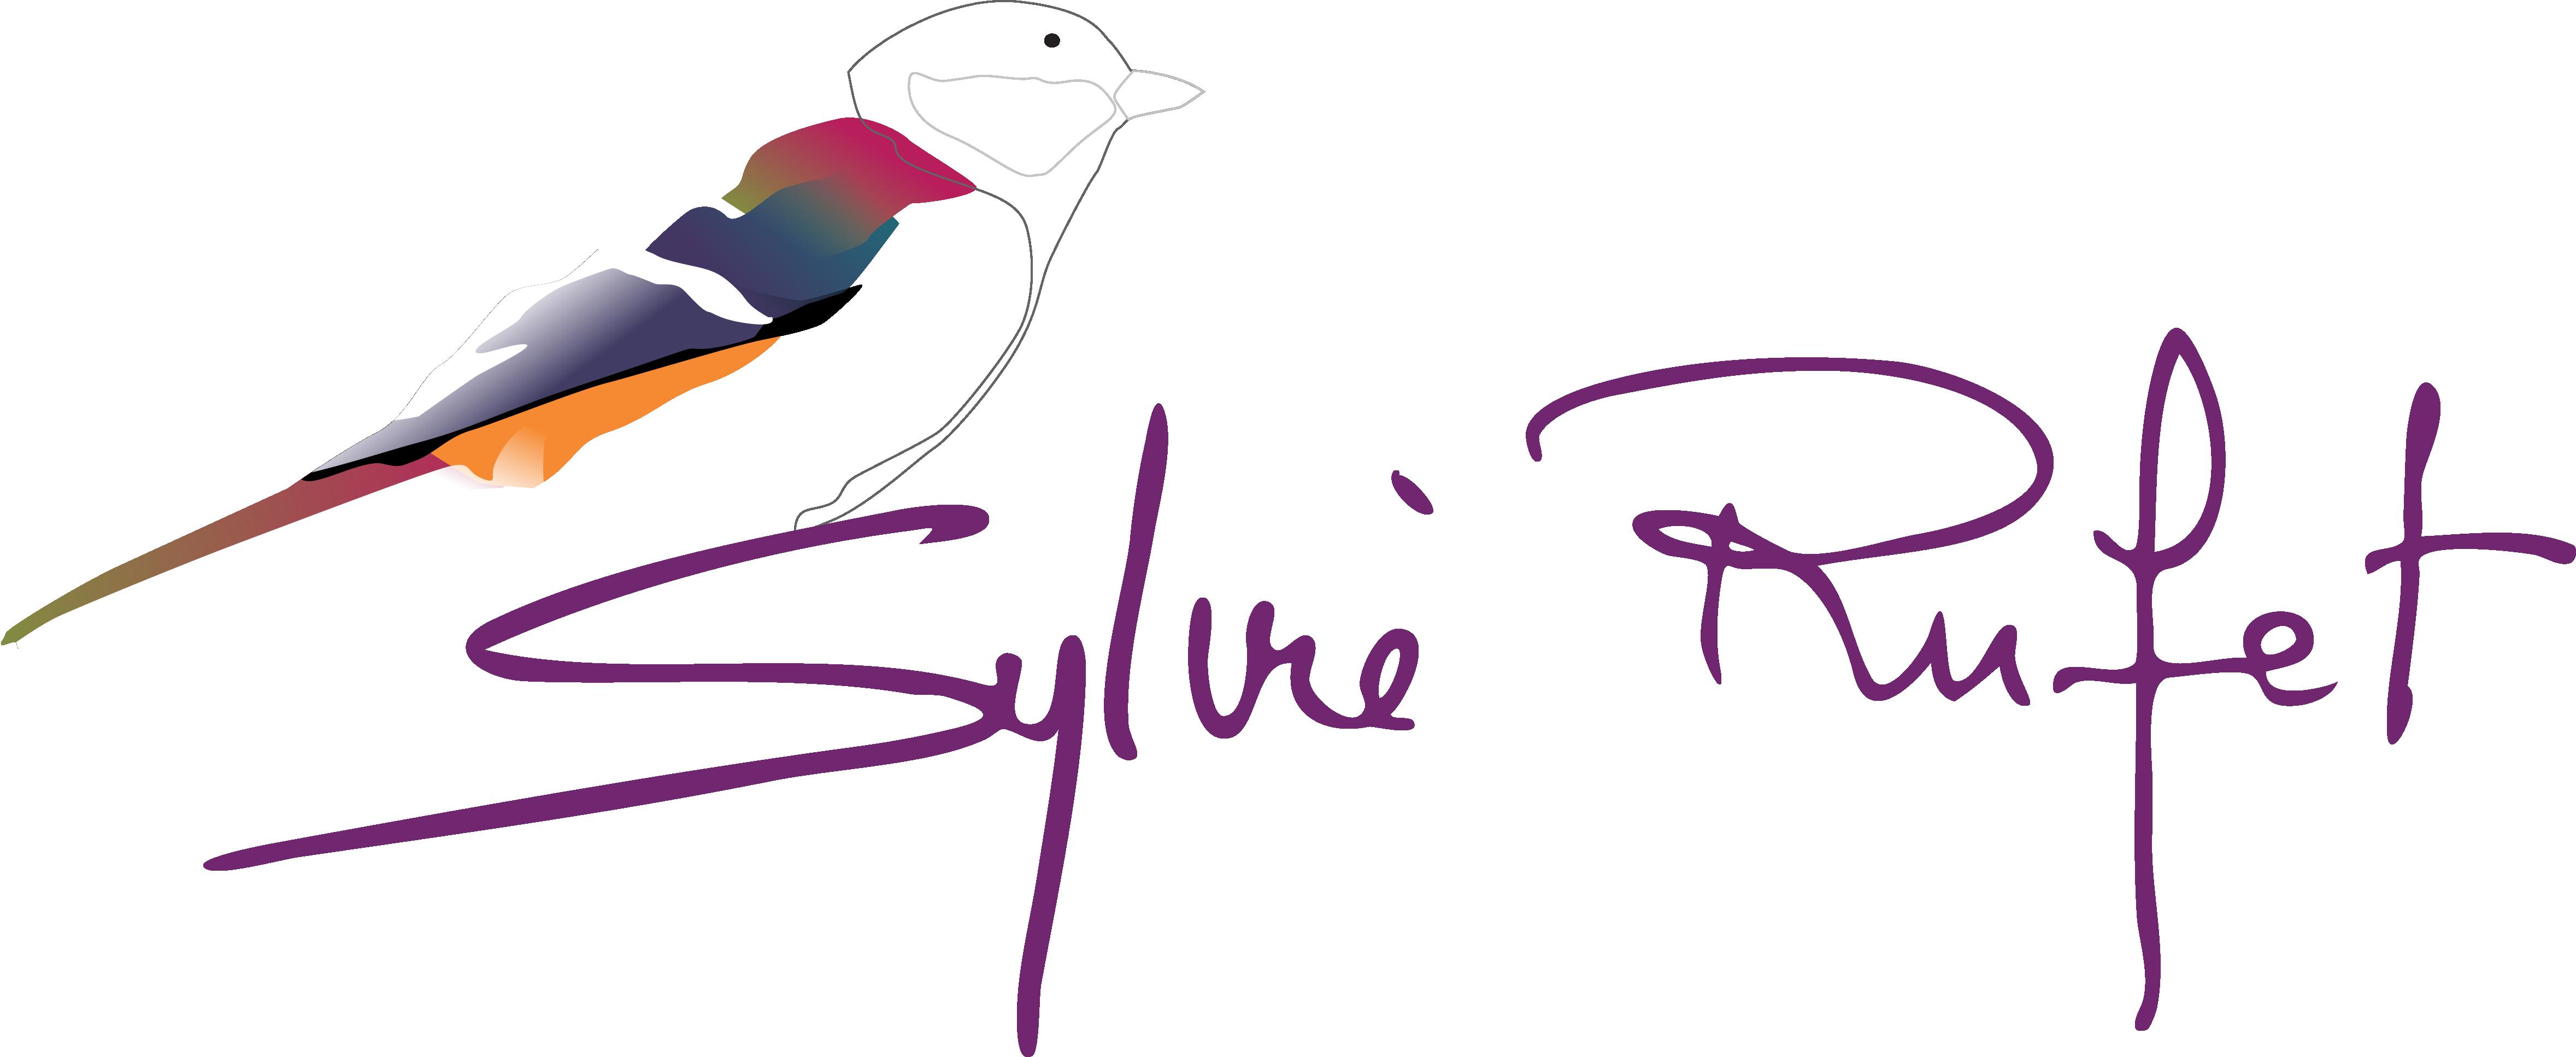 Oiseau stylisé Logo Sylvie Rufet